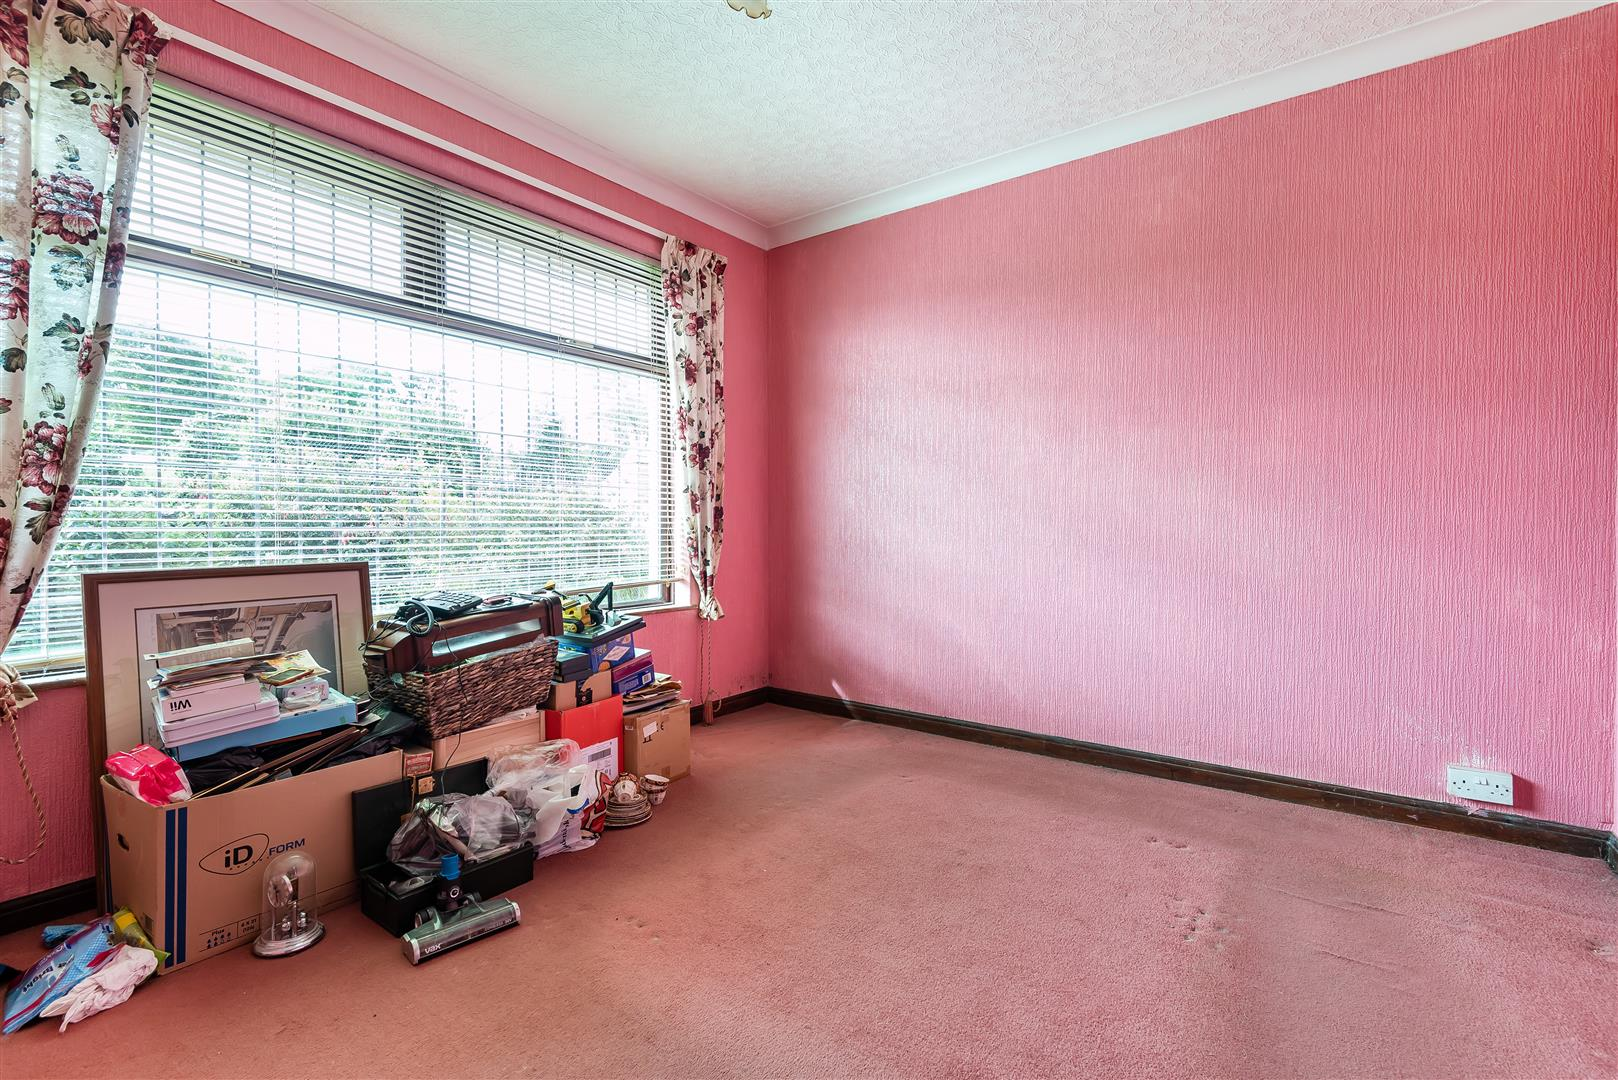 Knoyle Drive, Treboeth, Swansea, SA5 9AZ